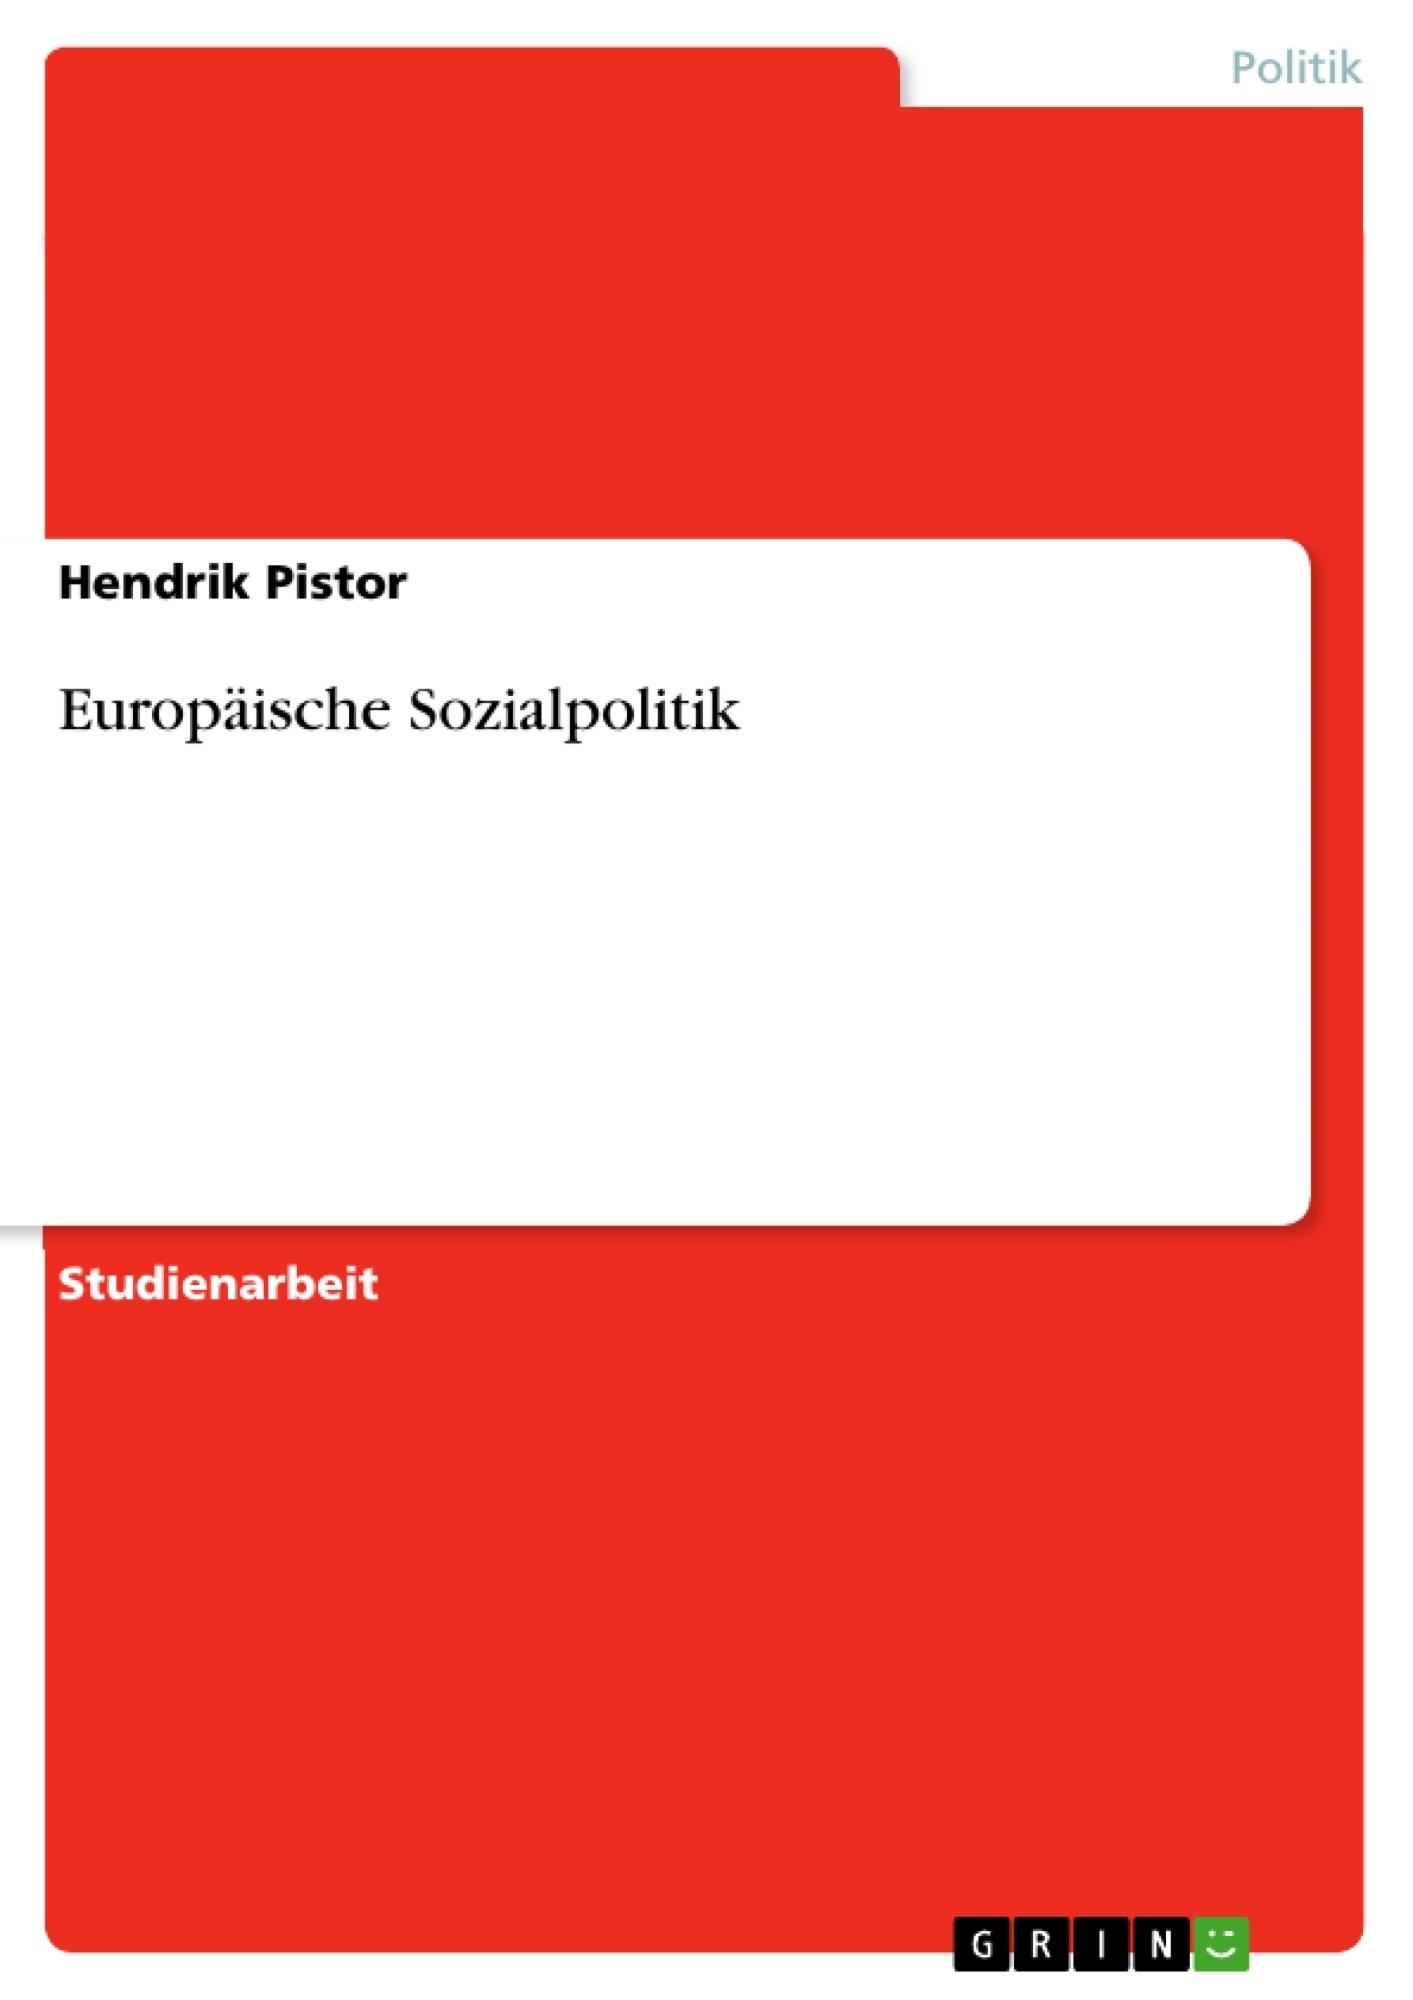 Titel: Europäische Sozialpolitik